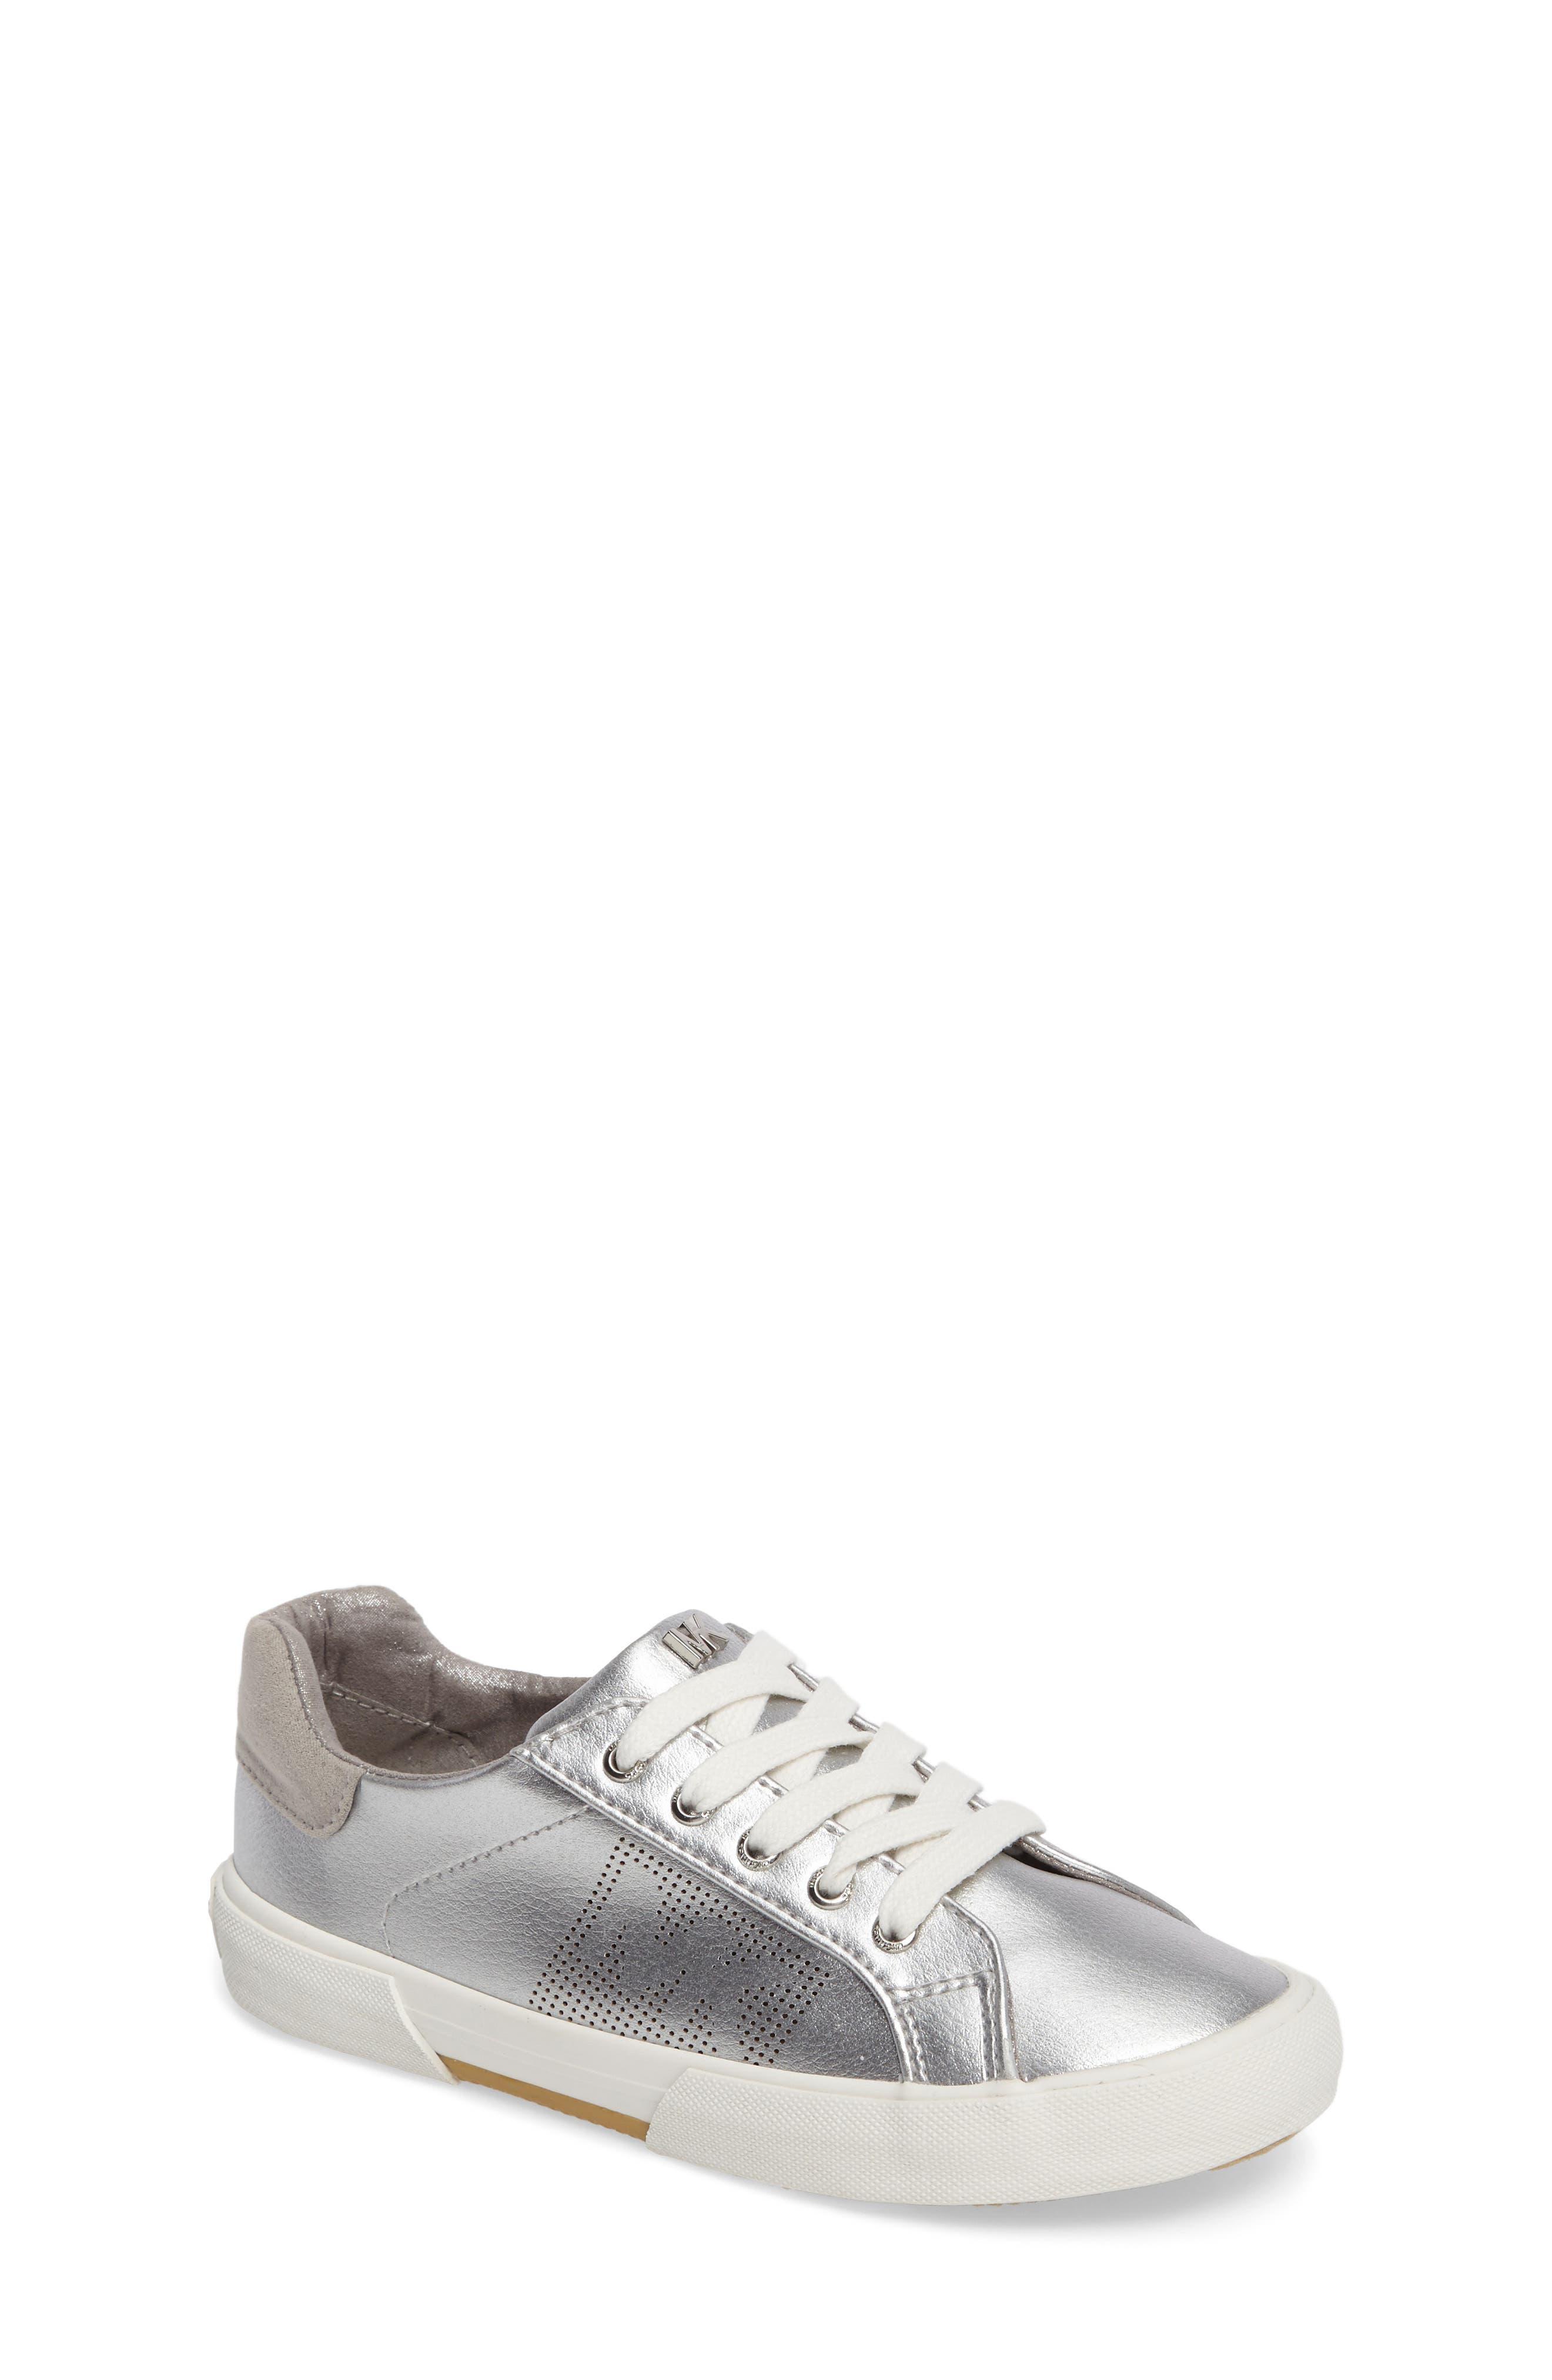 Ima Court Sneaker,                             Main thumbnail 1, color,                             040